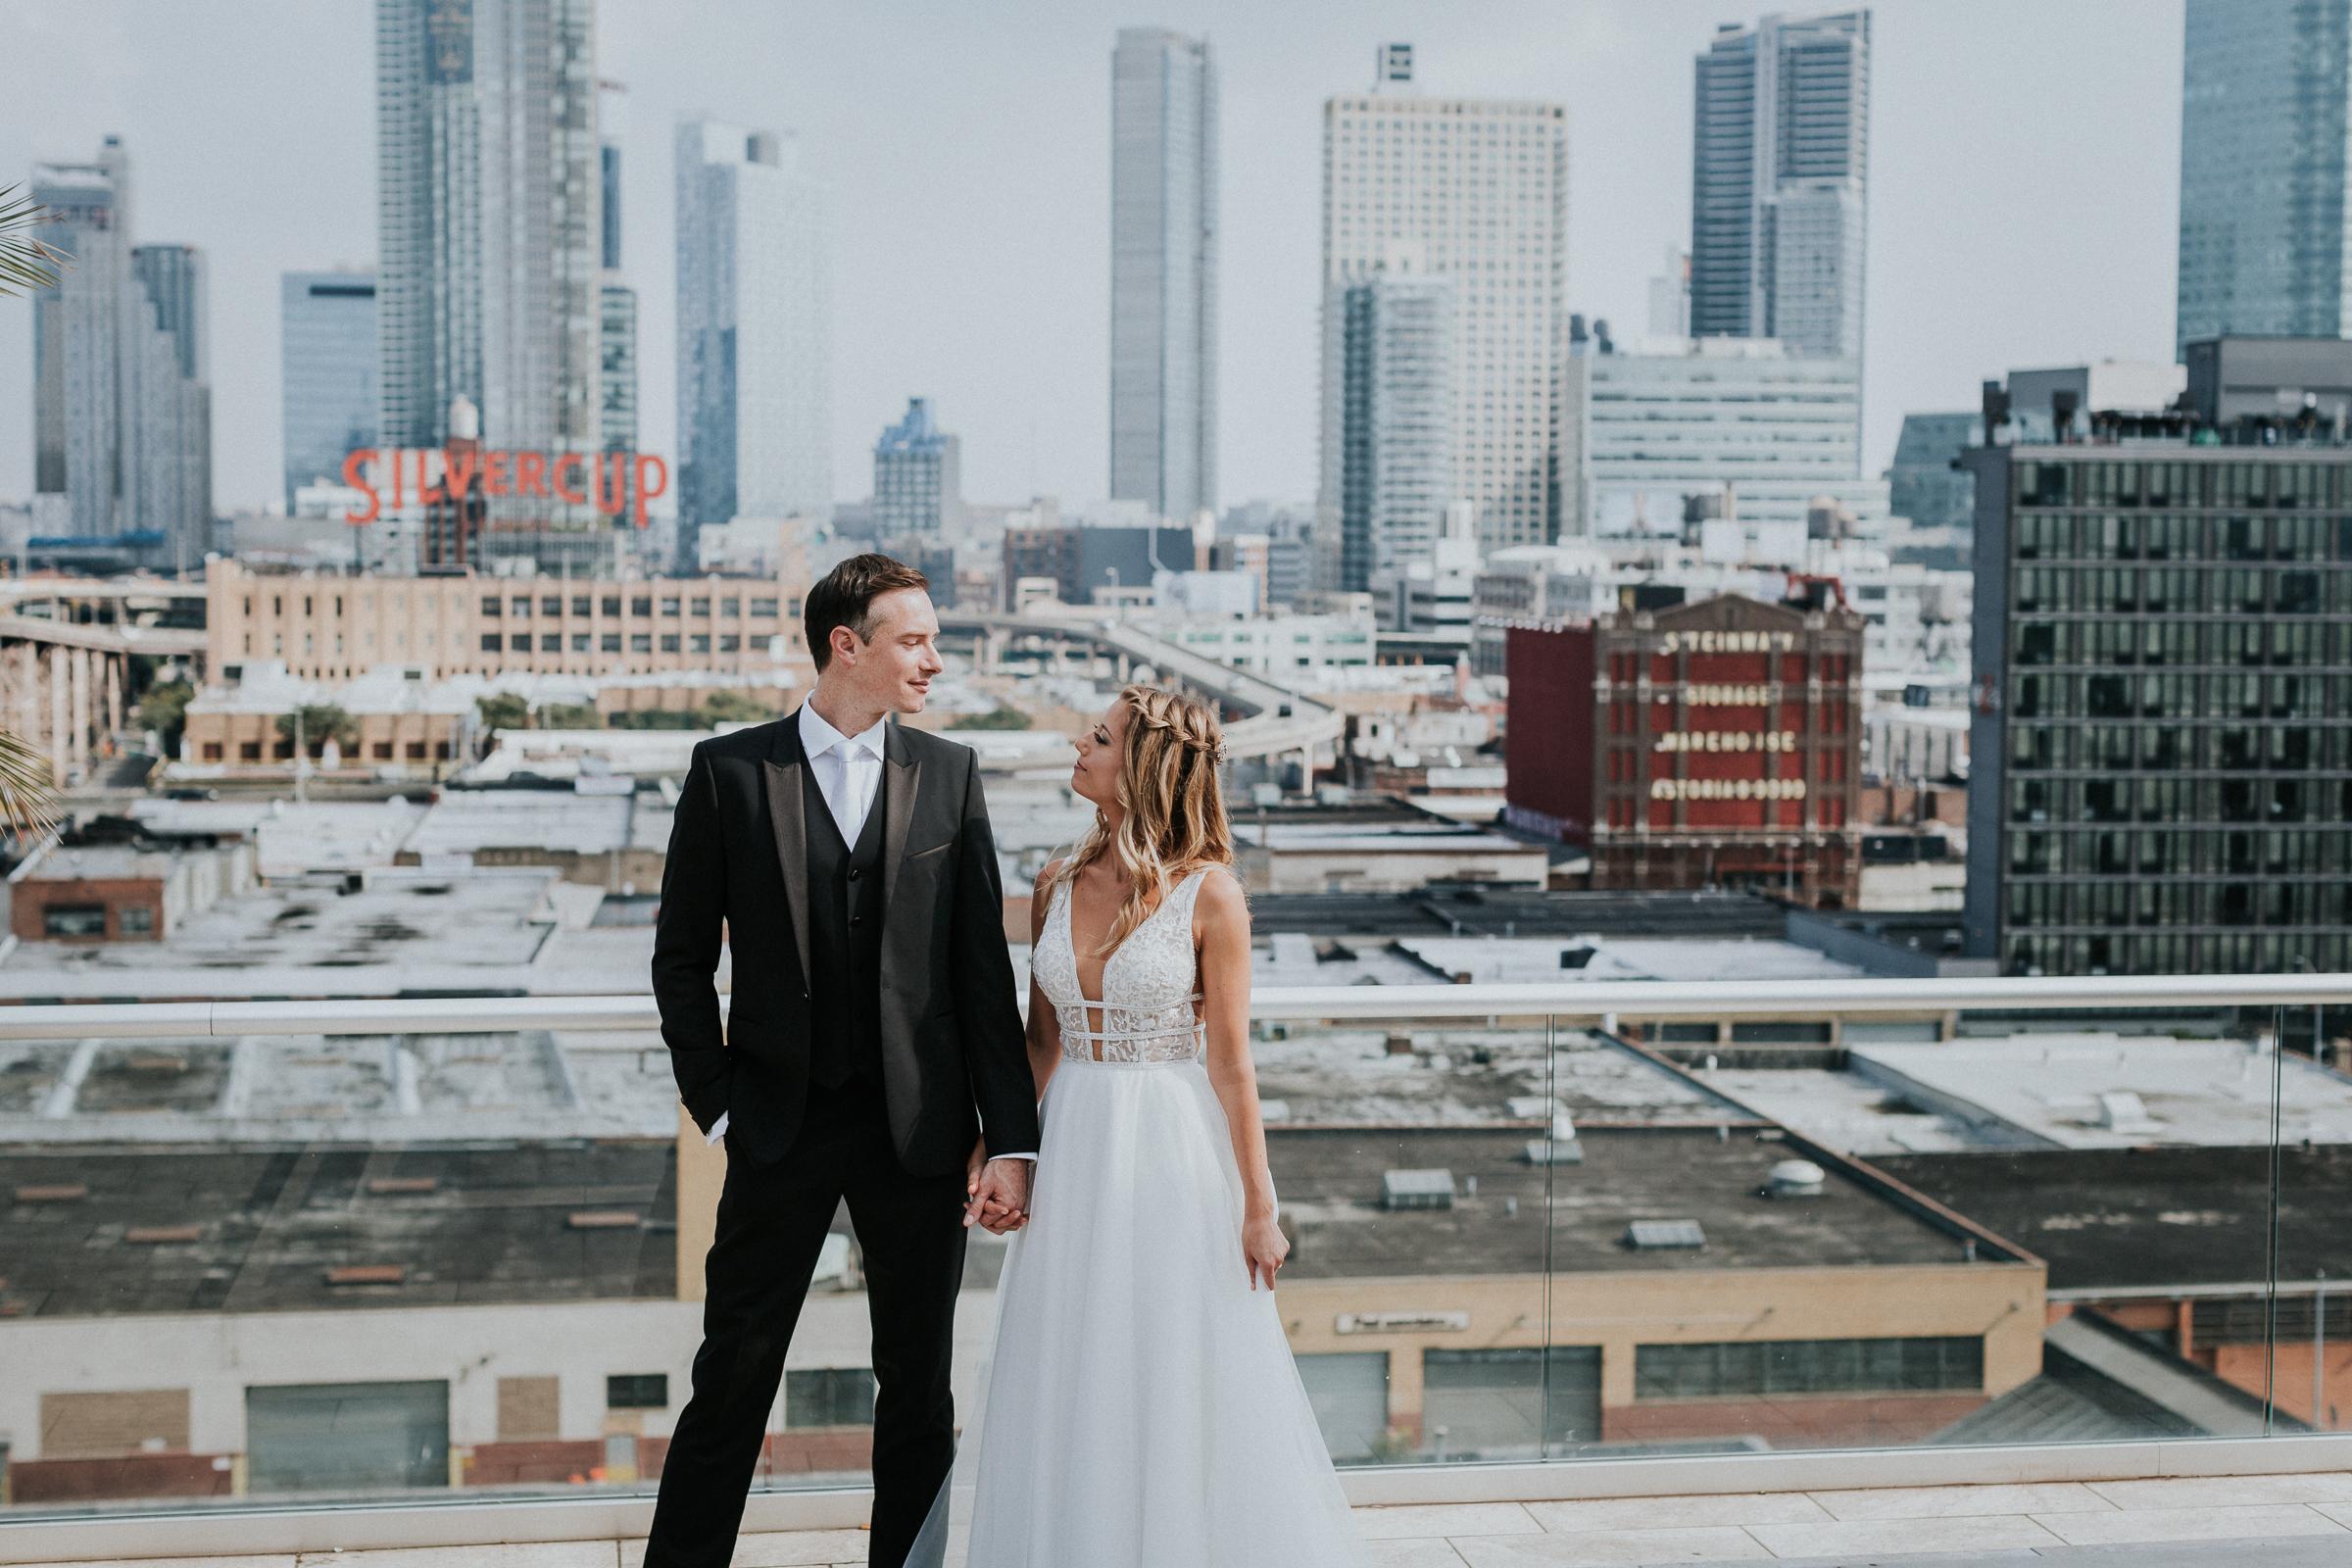 Ravel-Hotel-Penthouse-808-Long-Island-City-New-York-Documentary-Wedding-Photographer-24.jpg